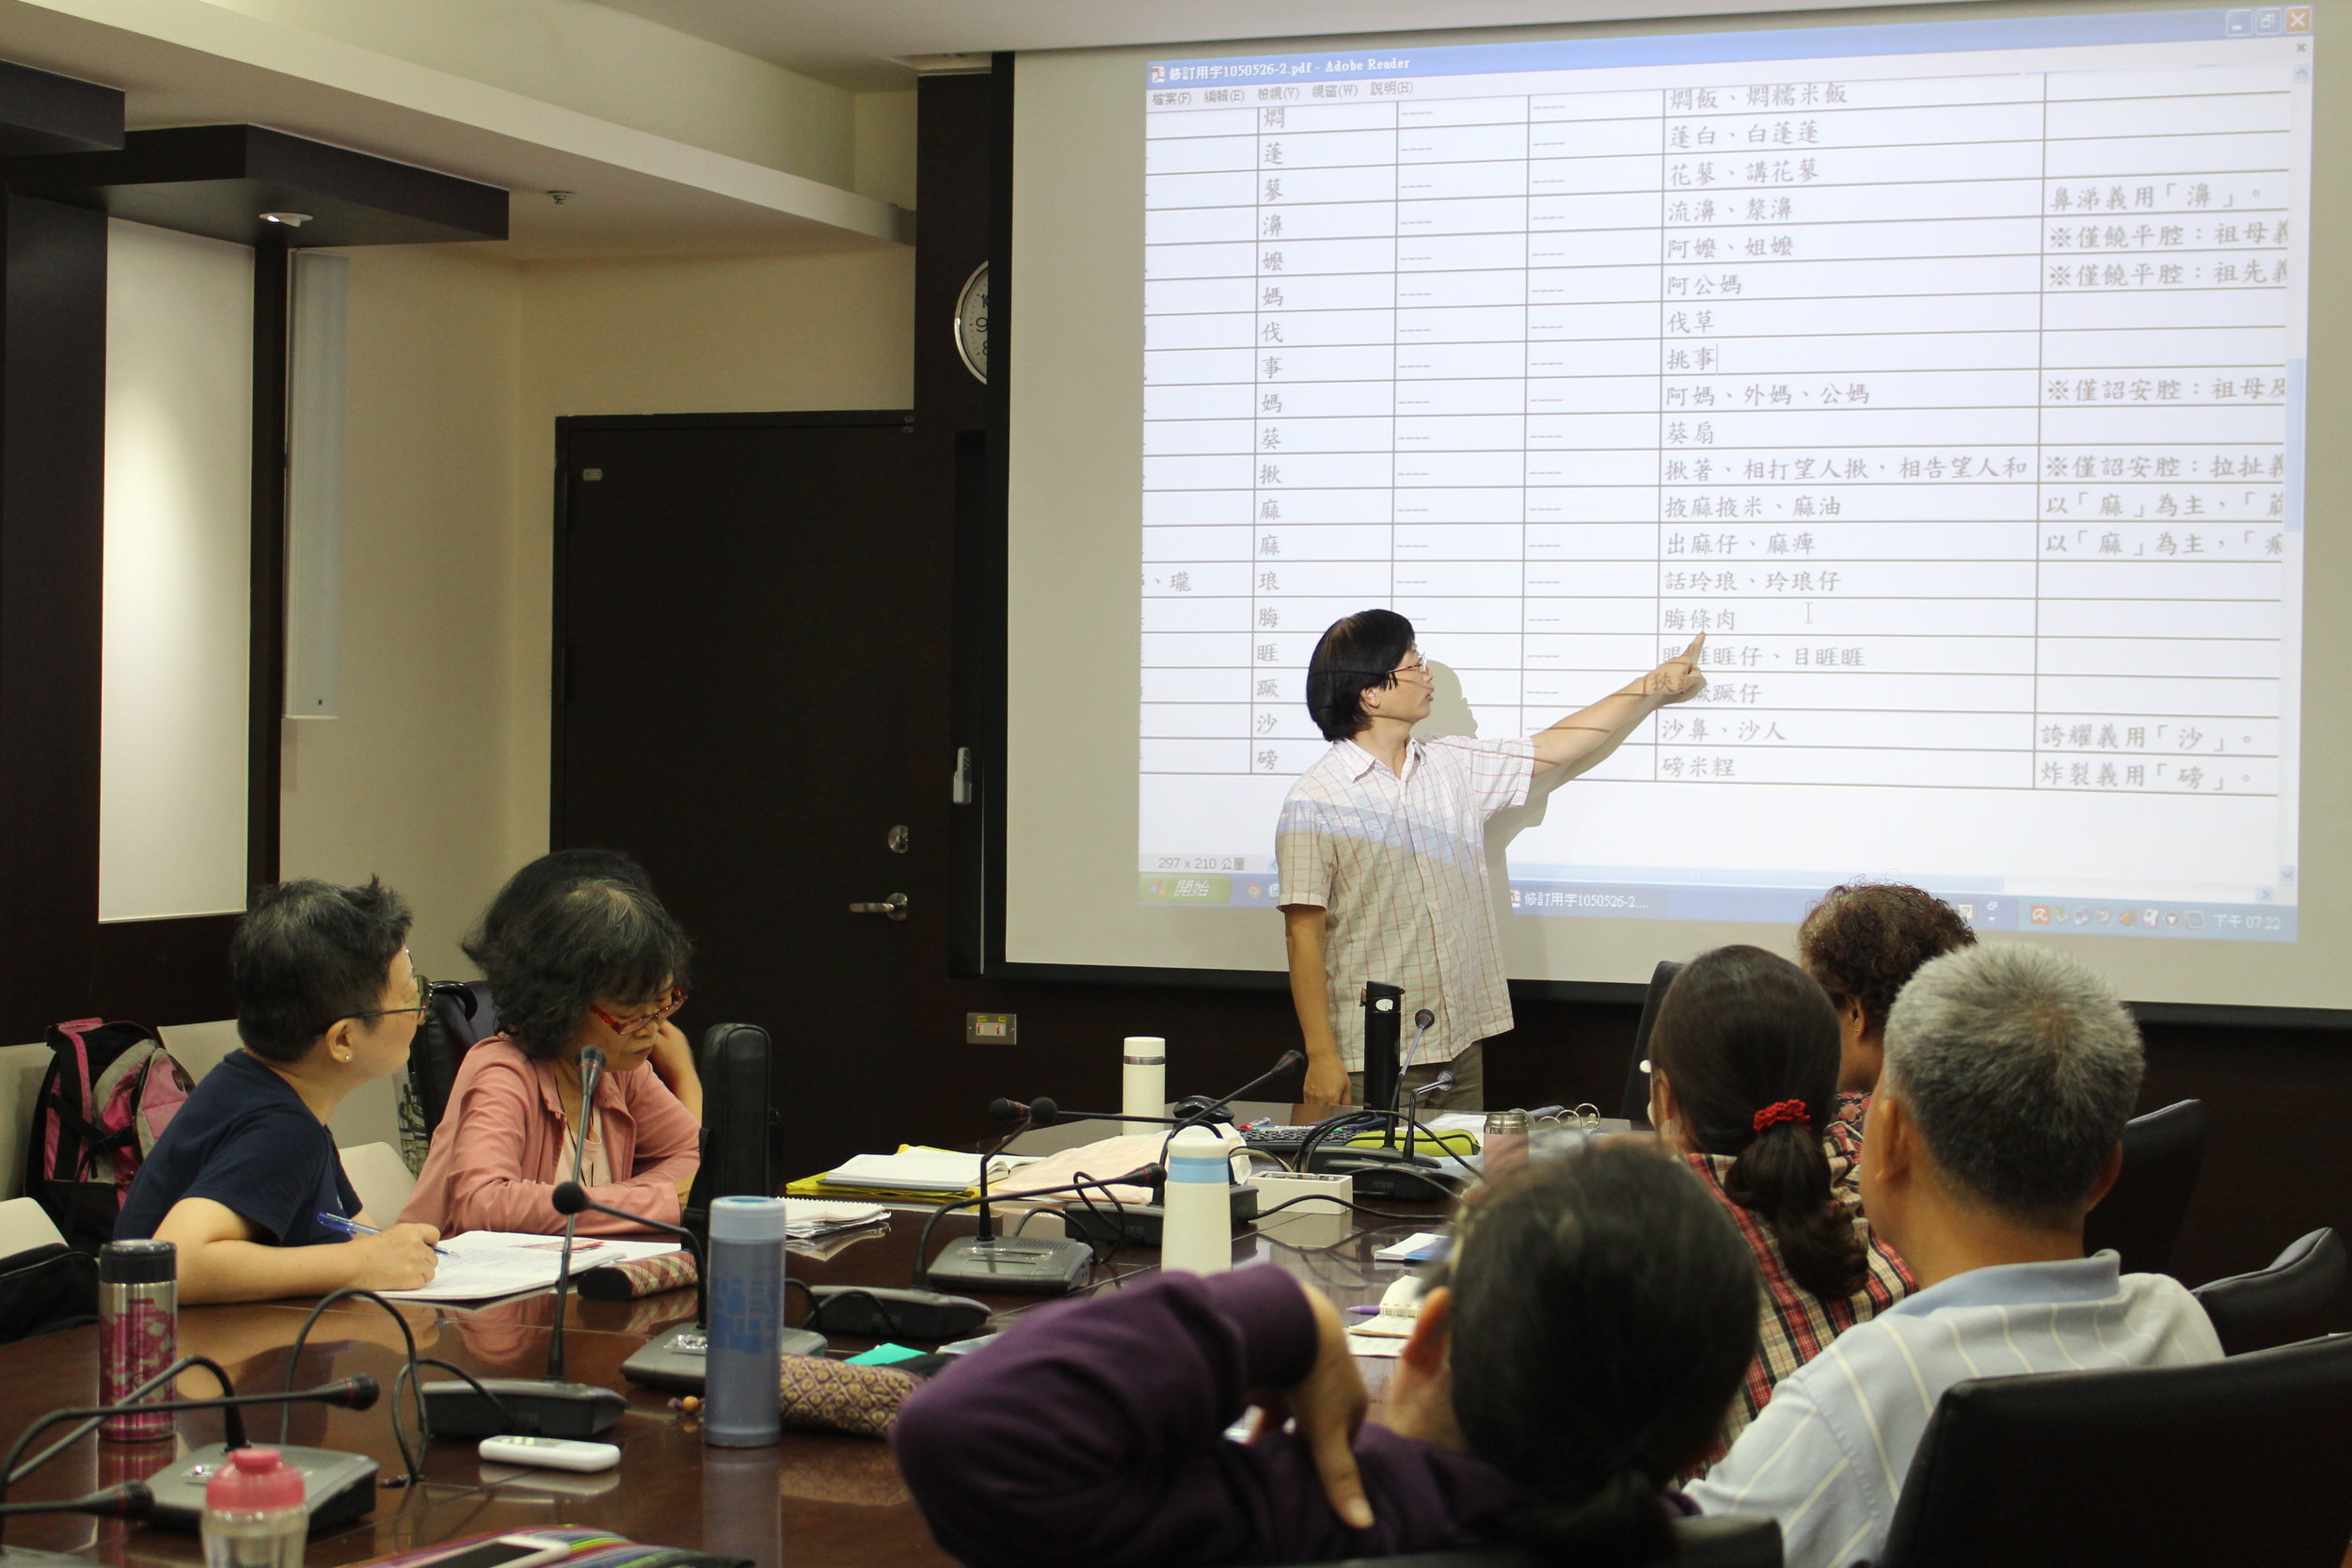 hakka language and culture-105-2-客家話的學習與文化的體驗.JPG